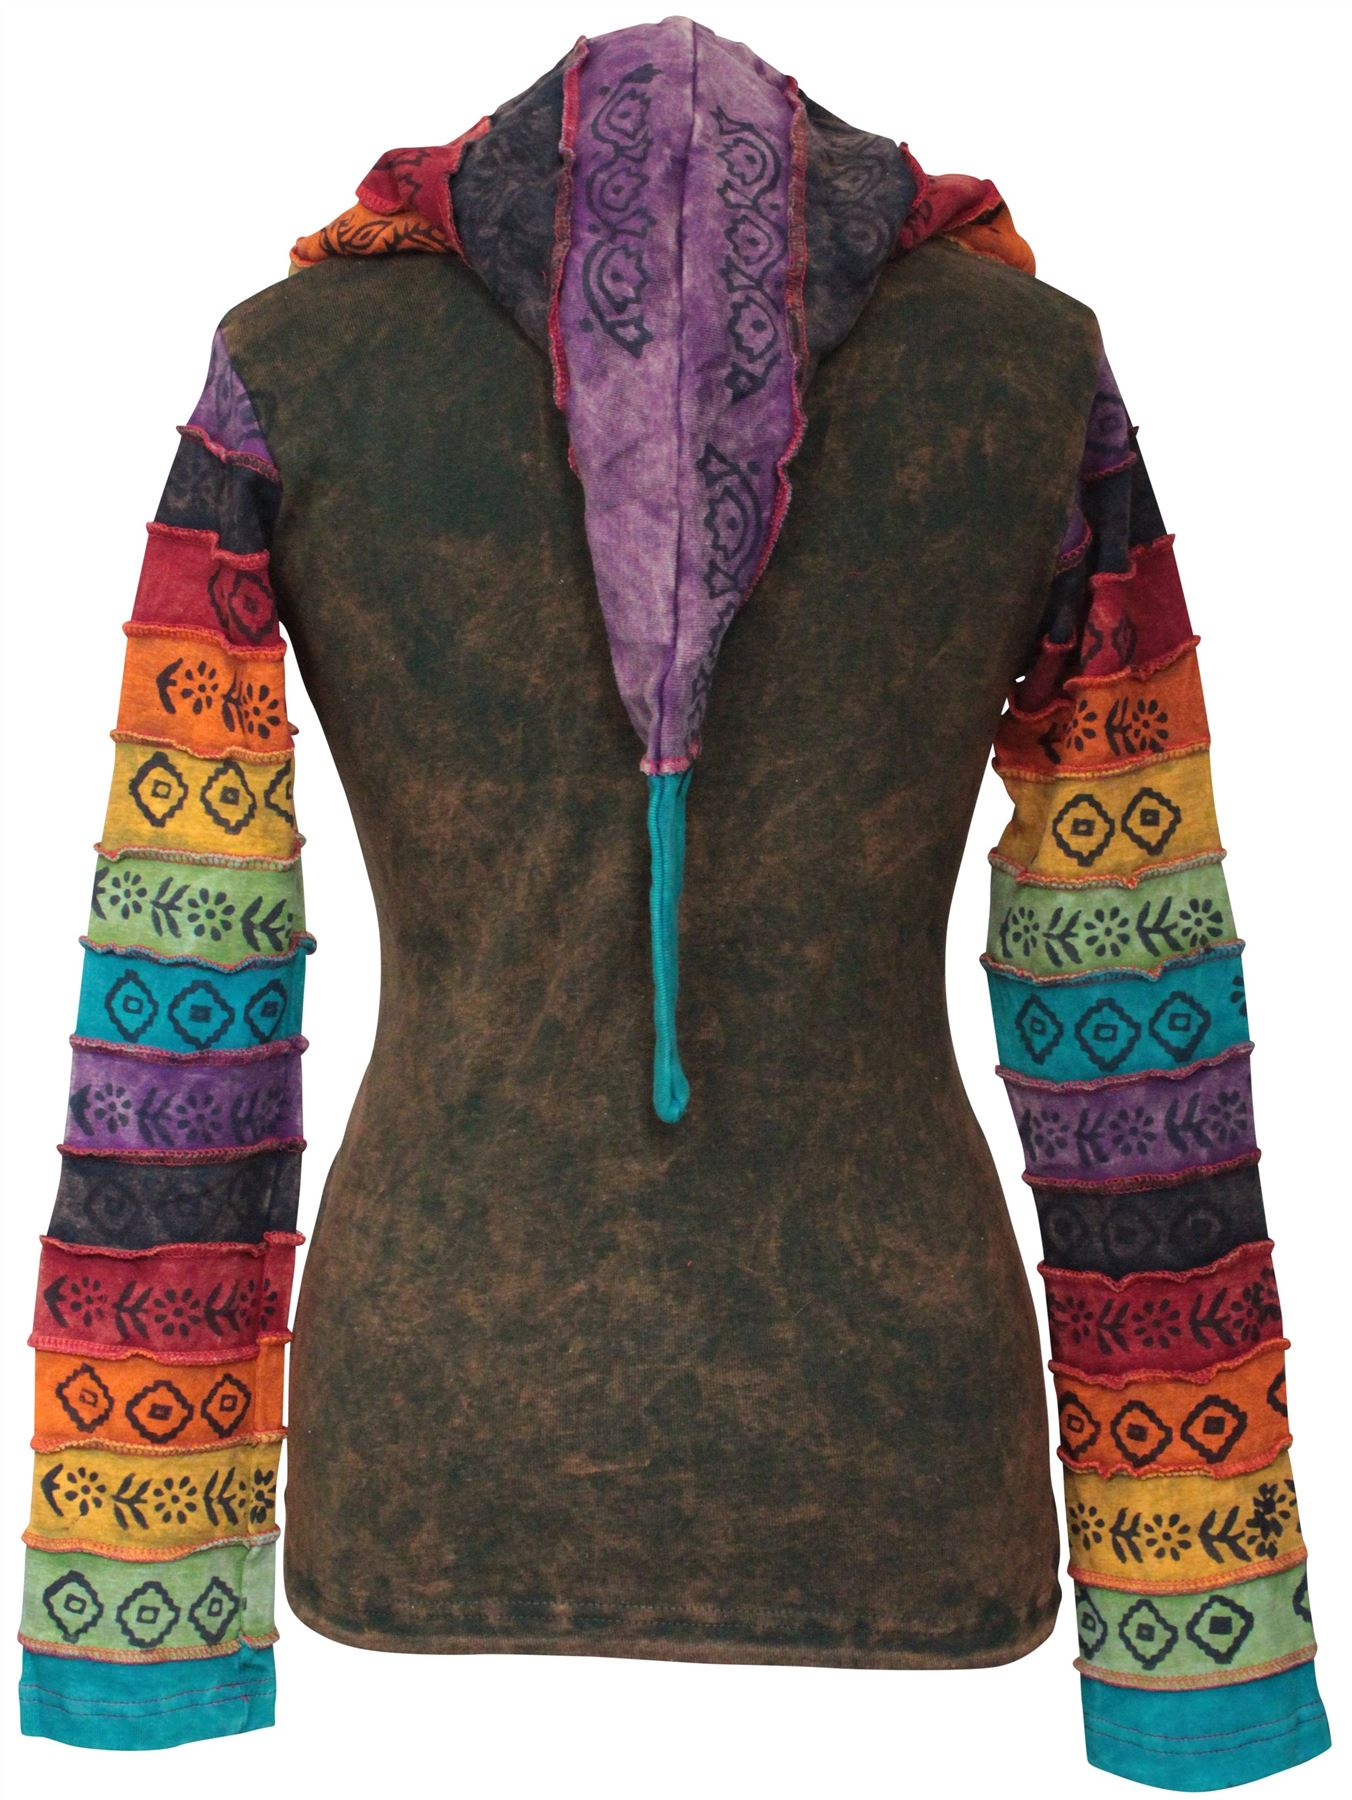 Women-039-s-Sun-Patchwork-Pixie-Hippy-Ribs-Hoodie-Light-Cotton-Hippie-Faded-Jacket thumbnail 10